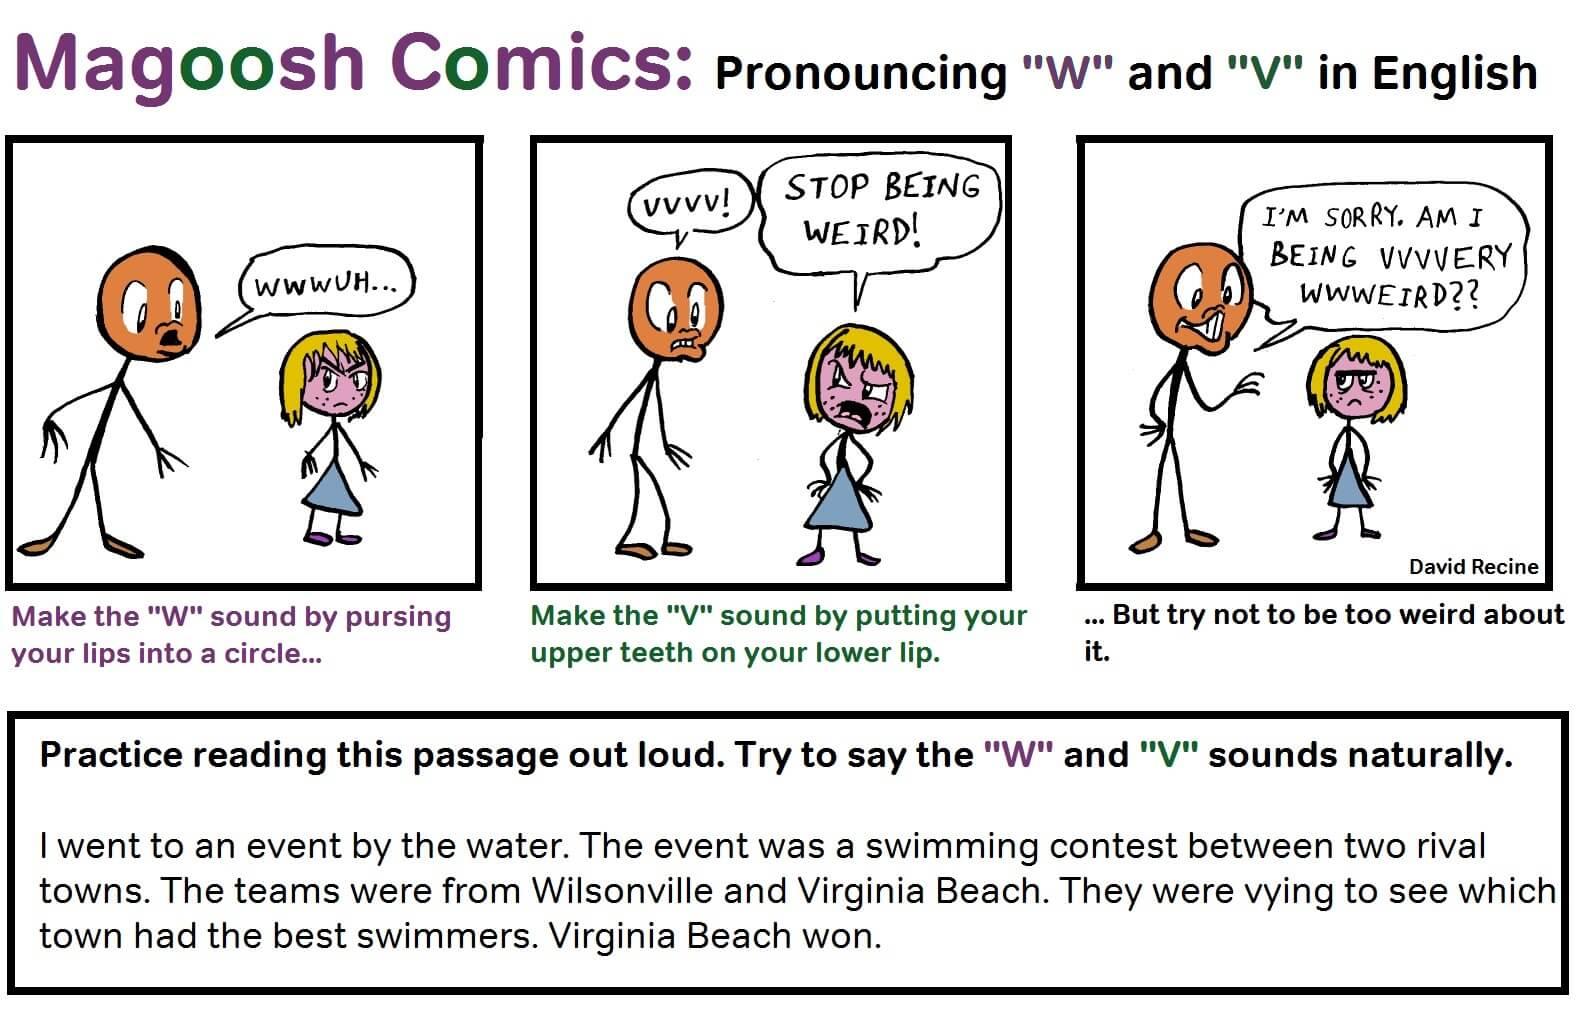 MagooshComics-V-W-weird